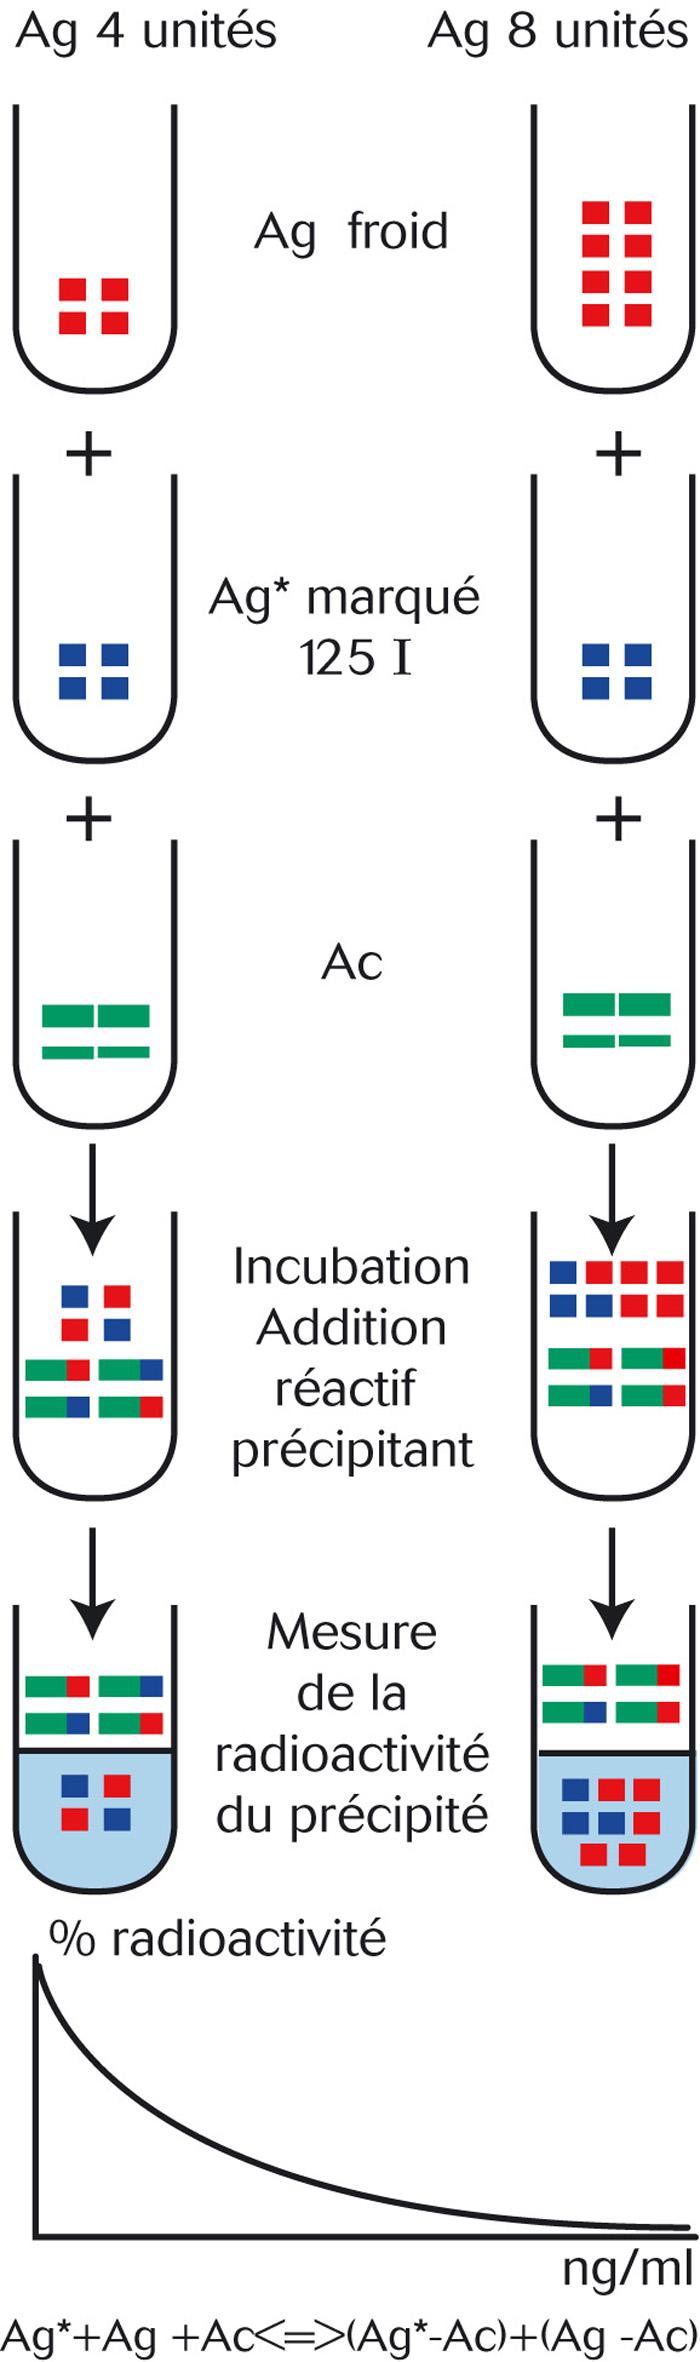 Méthode de radio-immunologie (anticorps polyclonaux)